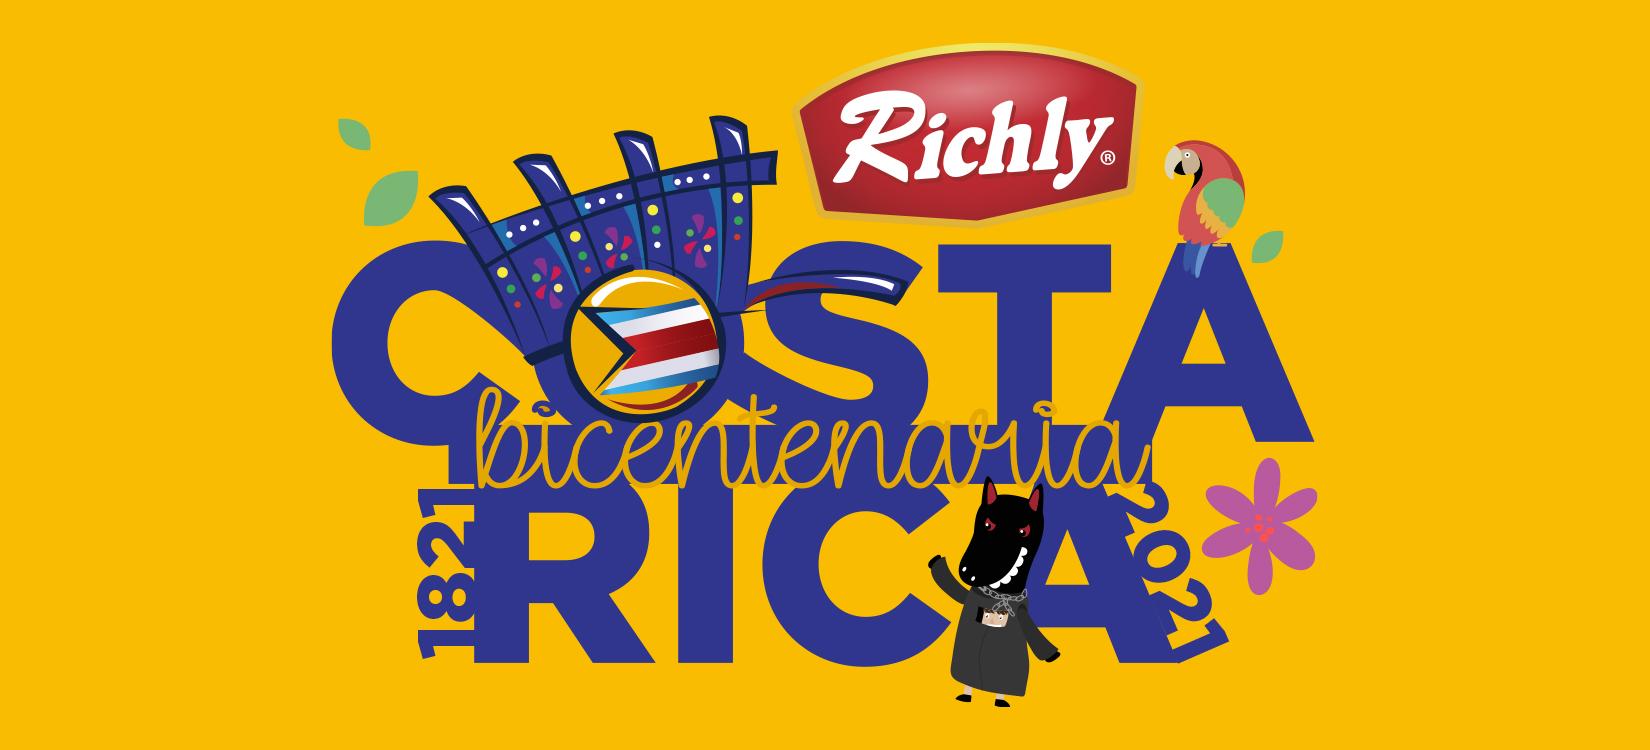 Alimentos Richly